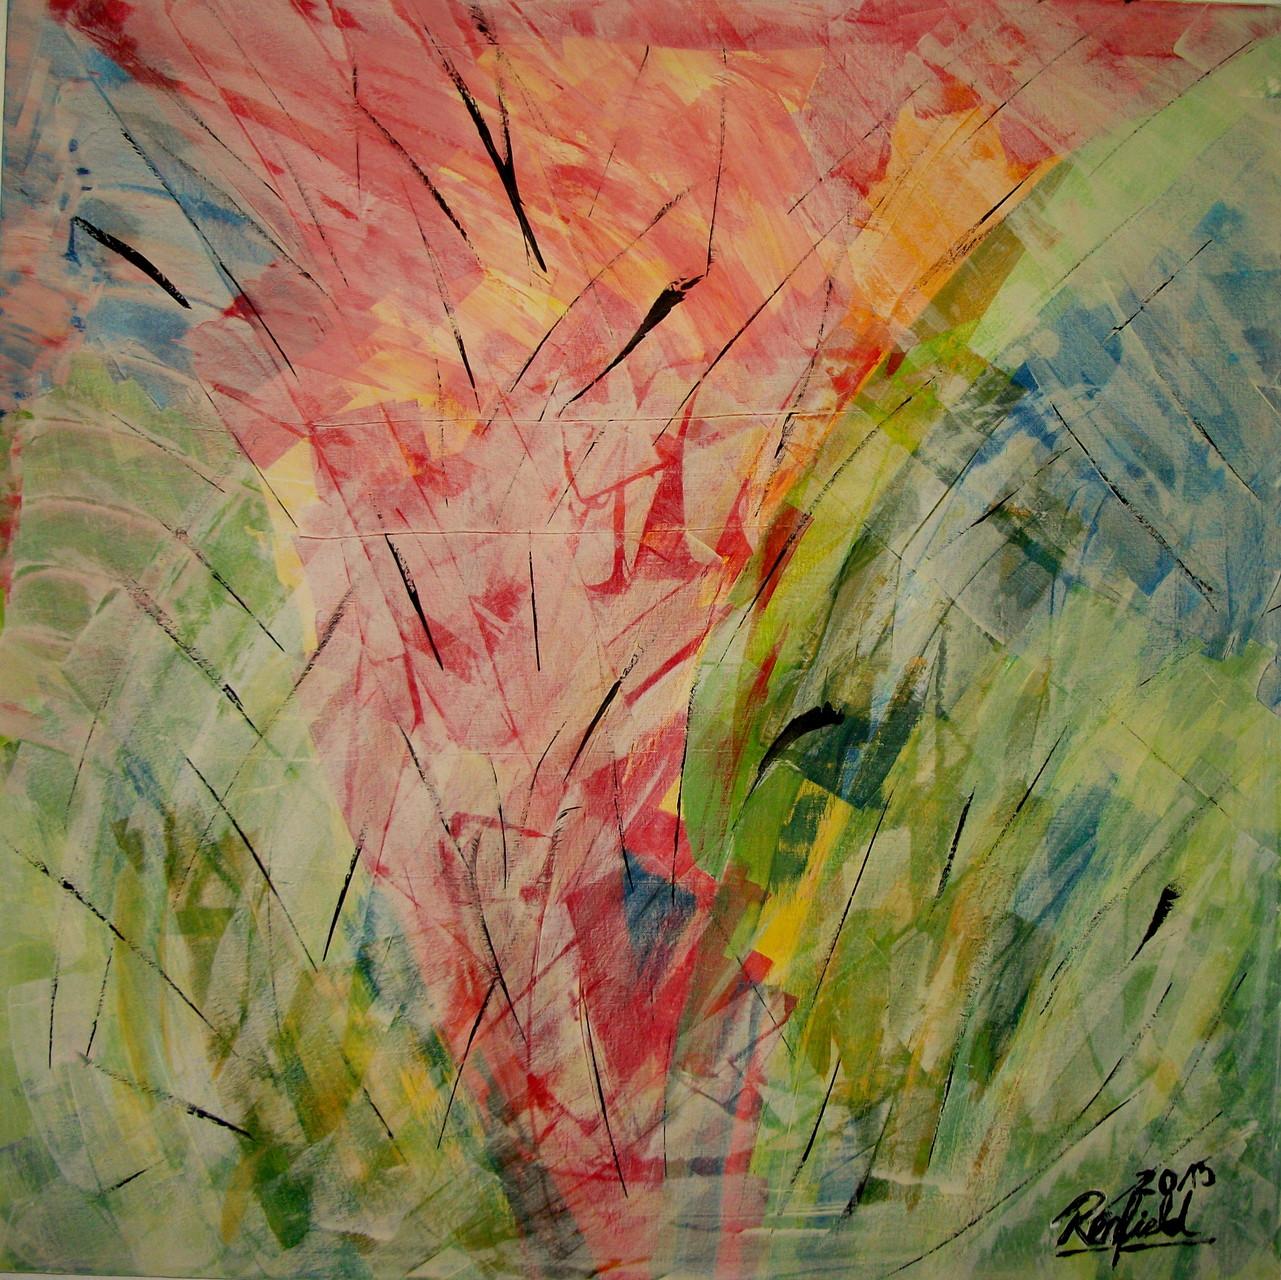 """Wild Style 7"" Acryl auf Leinwand ( 100 x 100 cm)."